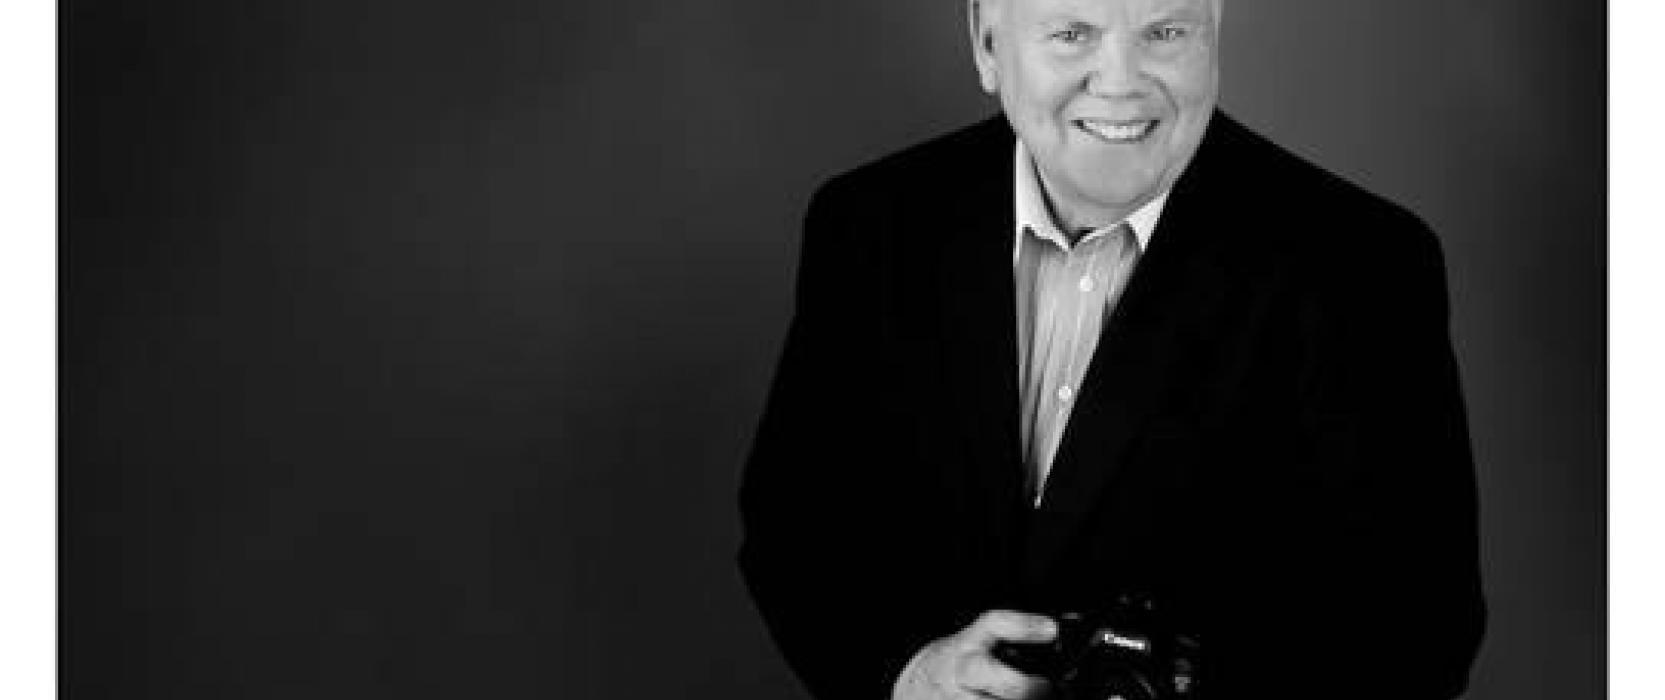 Mitchell Gold + Bob Williams Welcomes Award-Winning Photojournalist